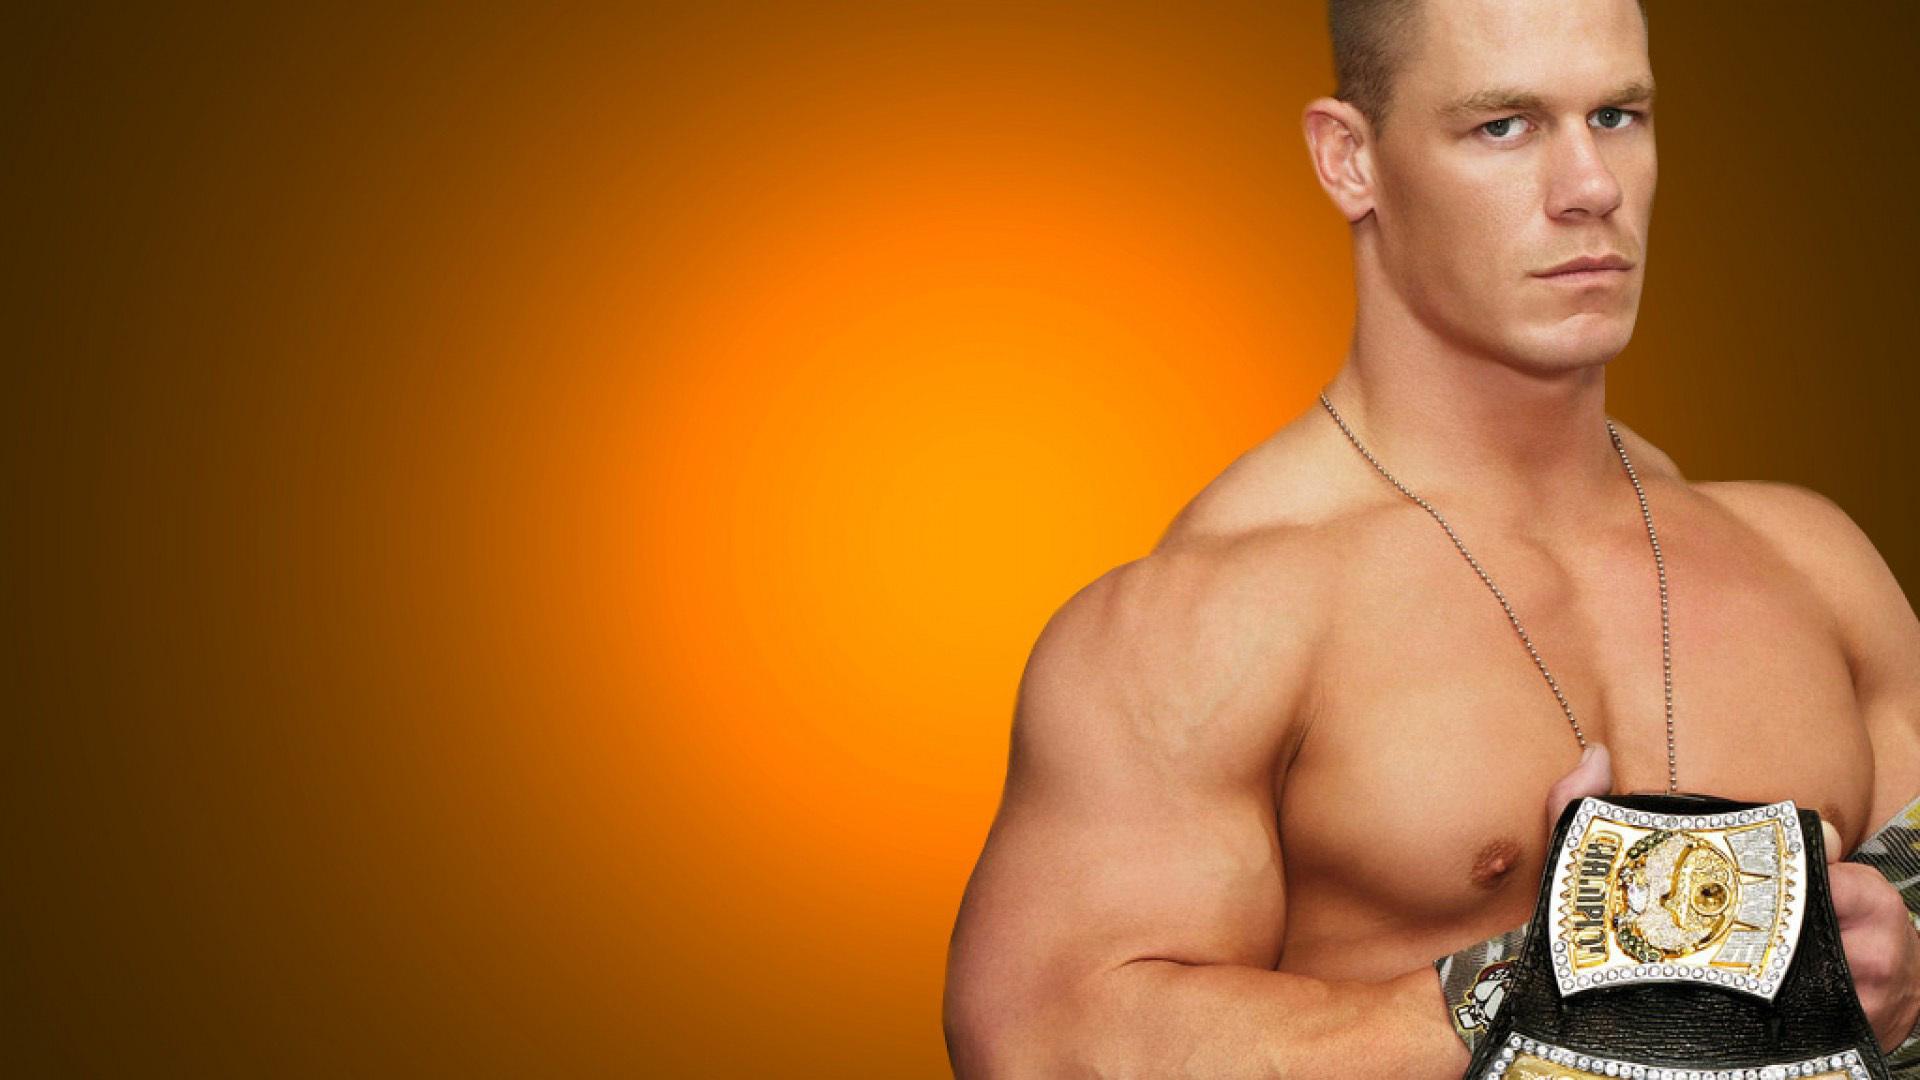 John Cena Download Free Backgrounds HD